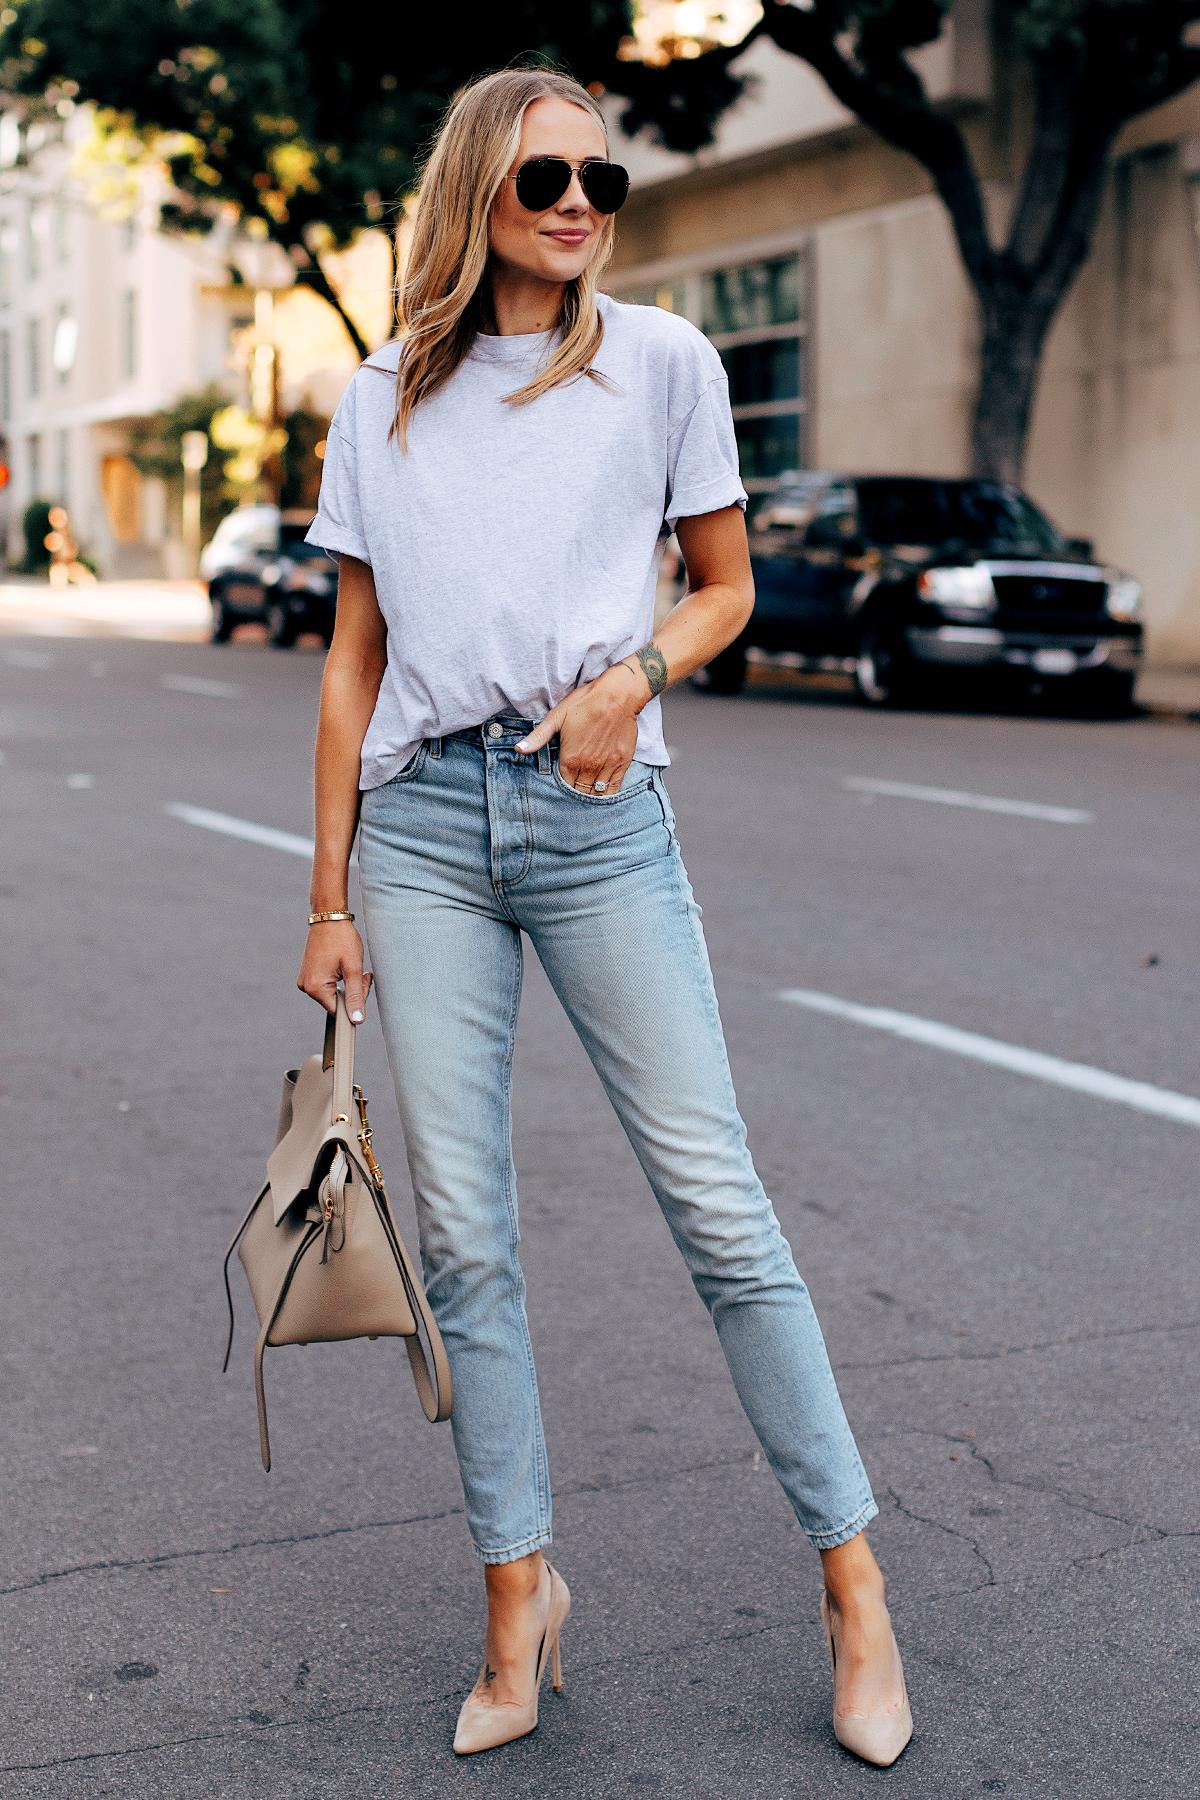 Blonde Woman Wearing Topshop Grey Tshirt Boyish High Rise Skinny Jeans Jimmy Choo Beige Romy Pumps Fashion Jackson San Diego Fashion Blogger Street Style